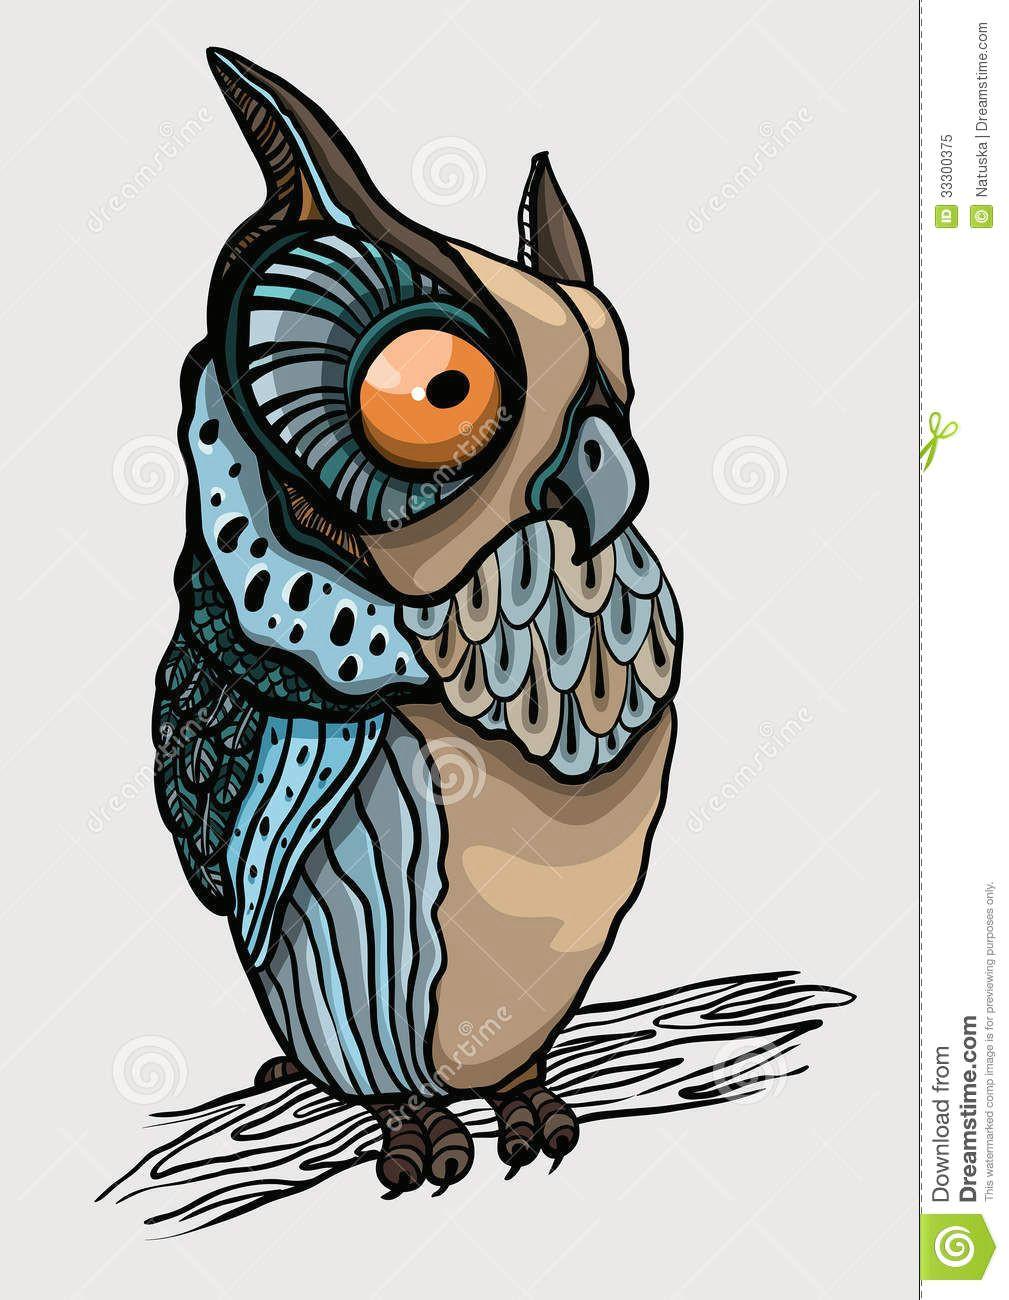 cartoon owl royalty free stock photo image 33300375